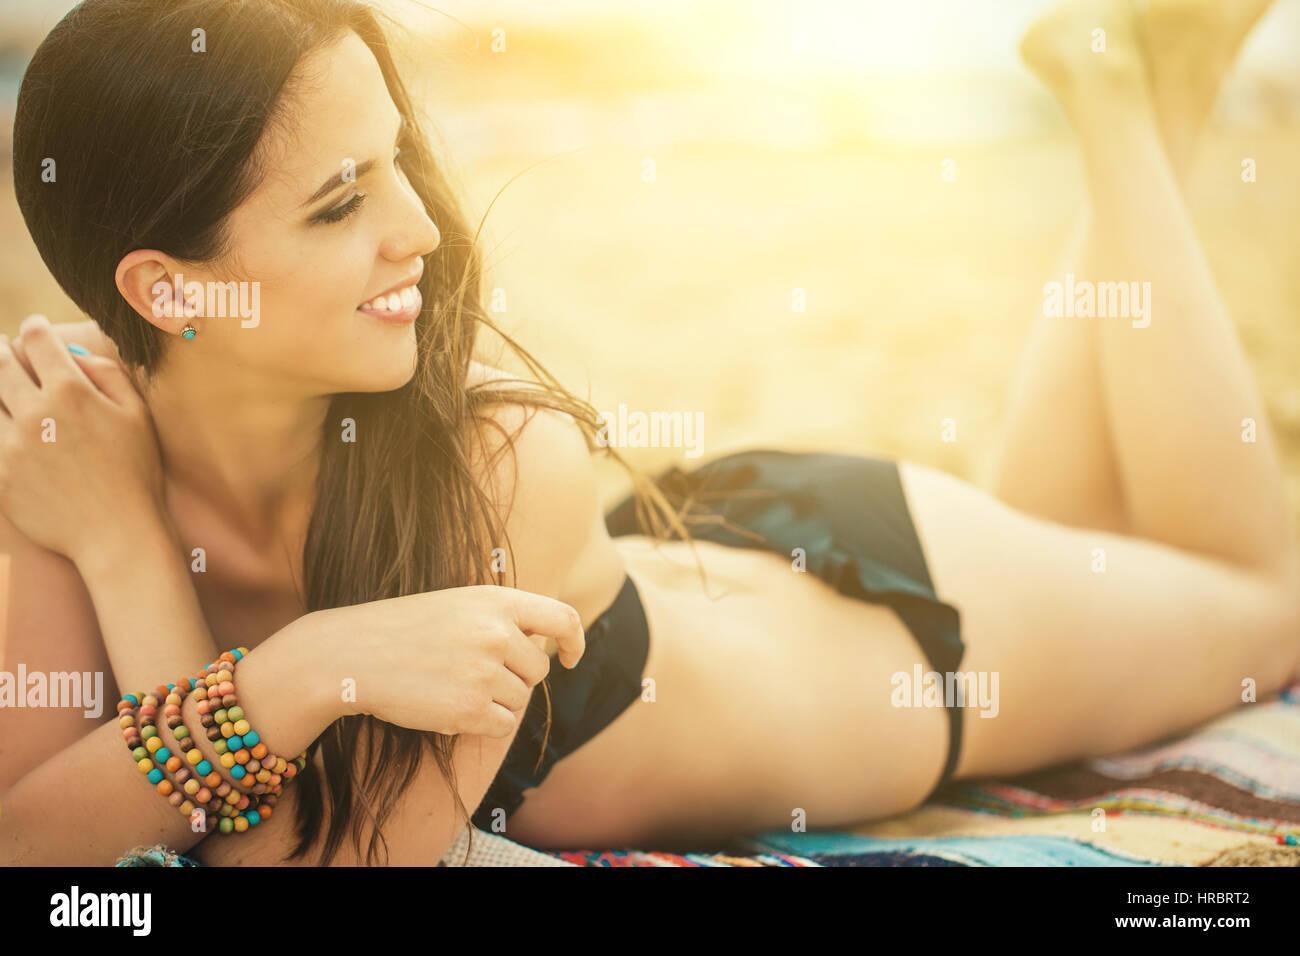 ABBY: Romantic sexual intercourse video